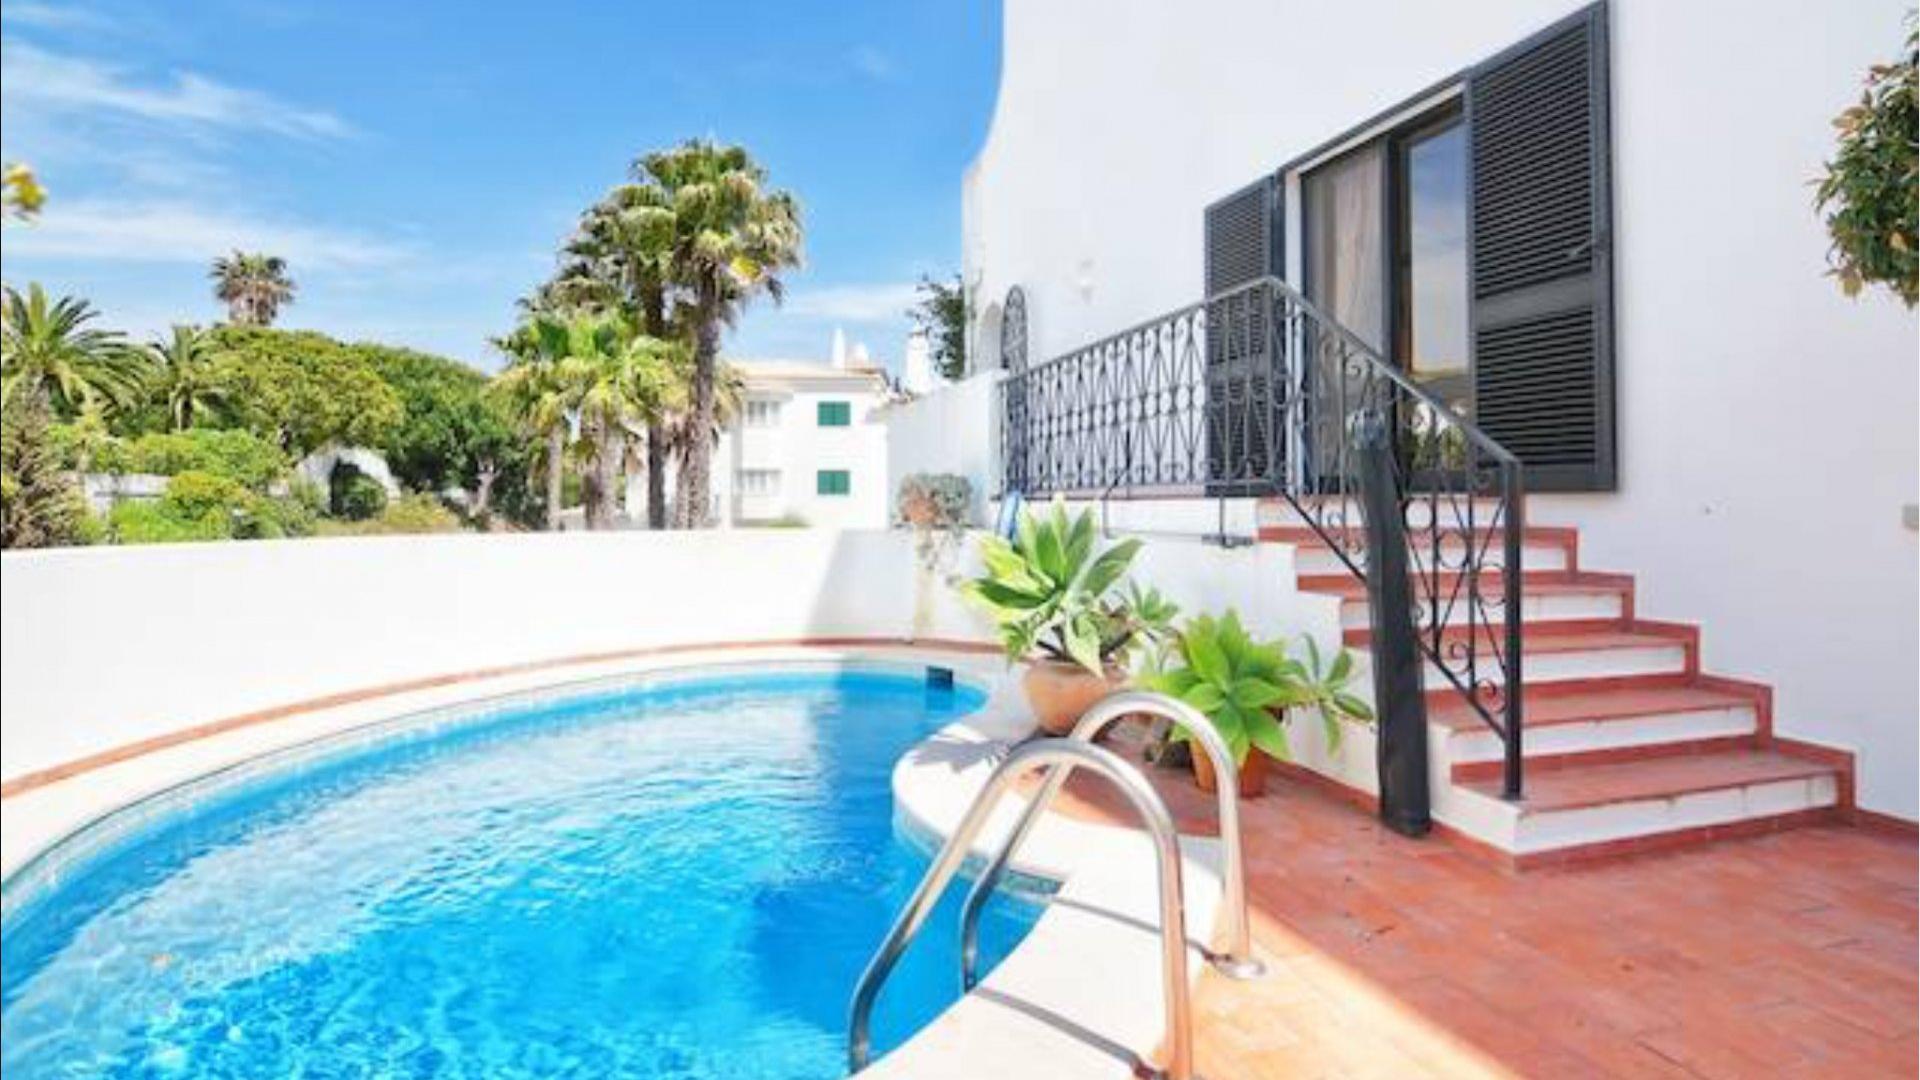 Villa Magnolia - Vale do Lobo, Algarve - 40_00c493d944ba24cf063165277b575ba41.jpg